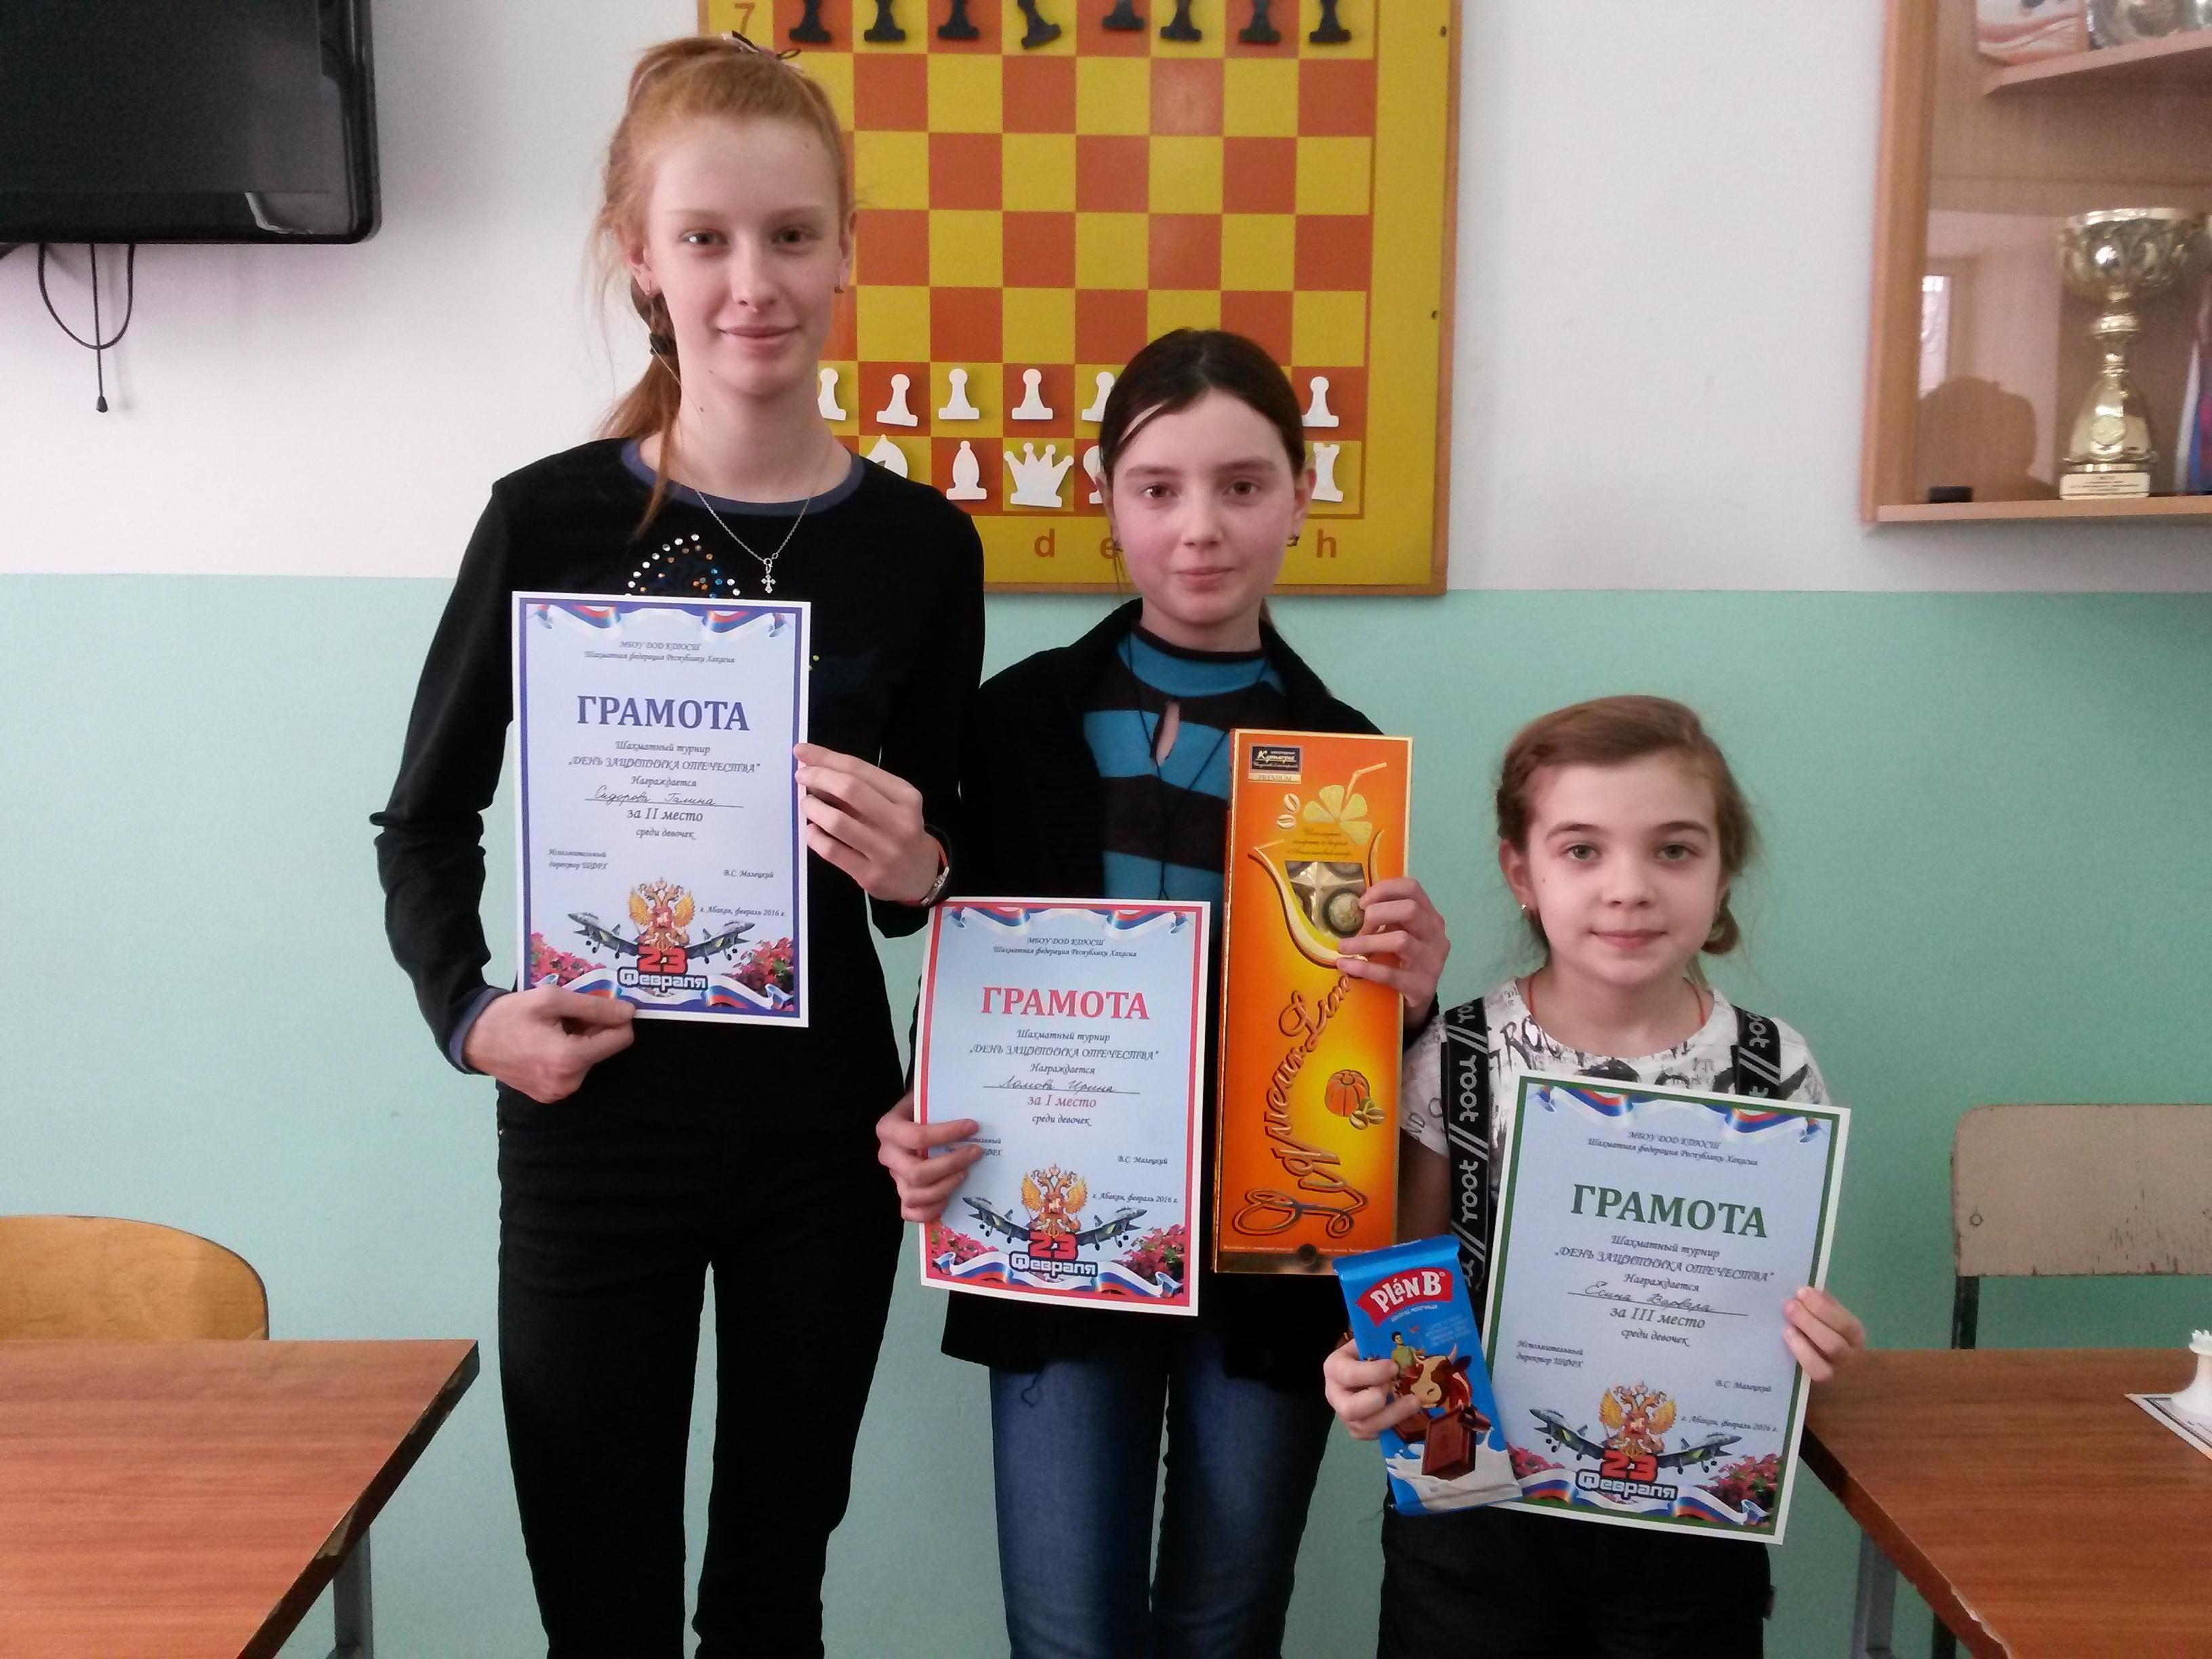 Слева направо: Сидорова Г.(2 место), Ломова Ирина(1 место), Есина Варвара(3 место)